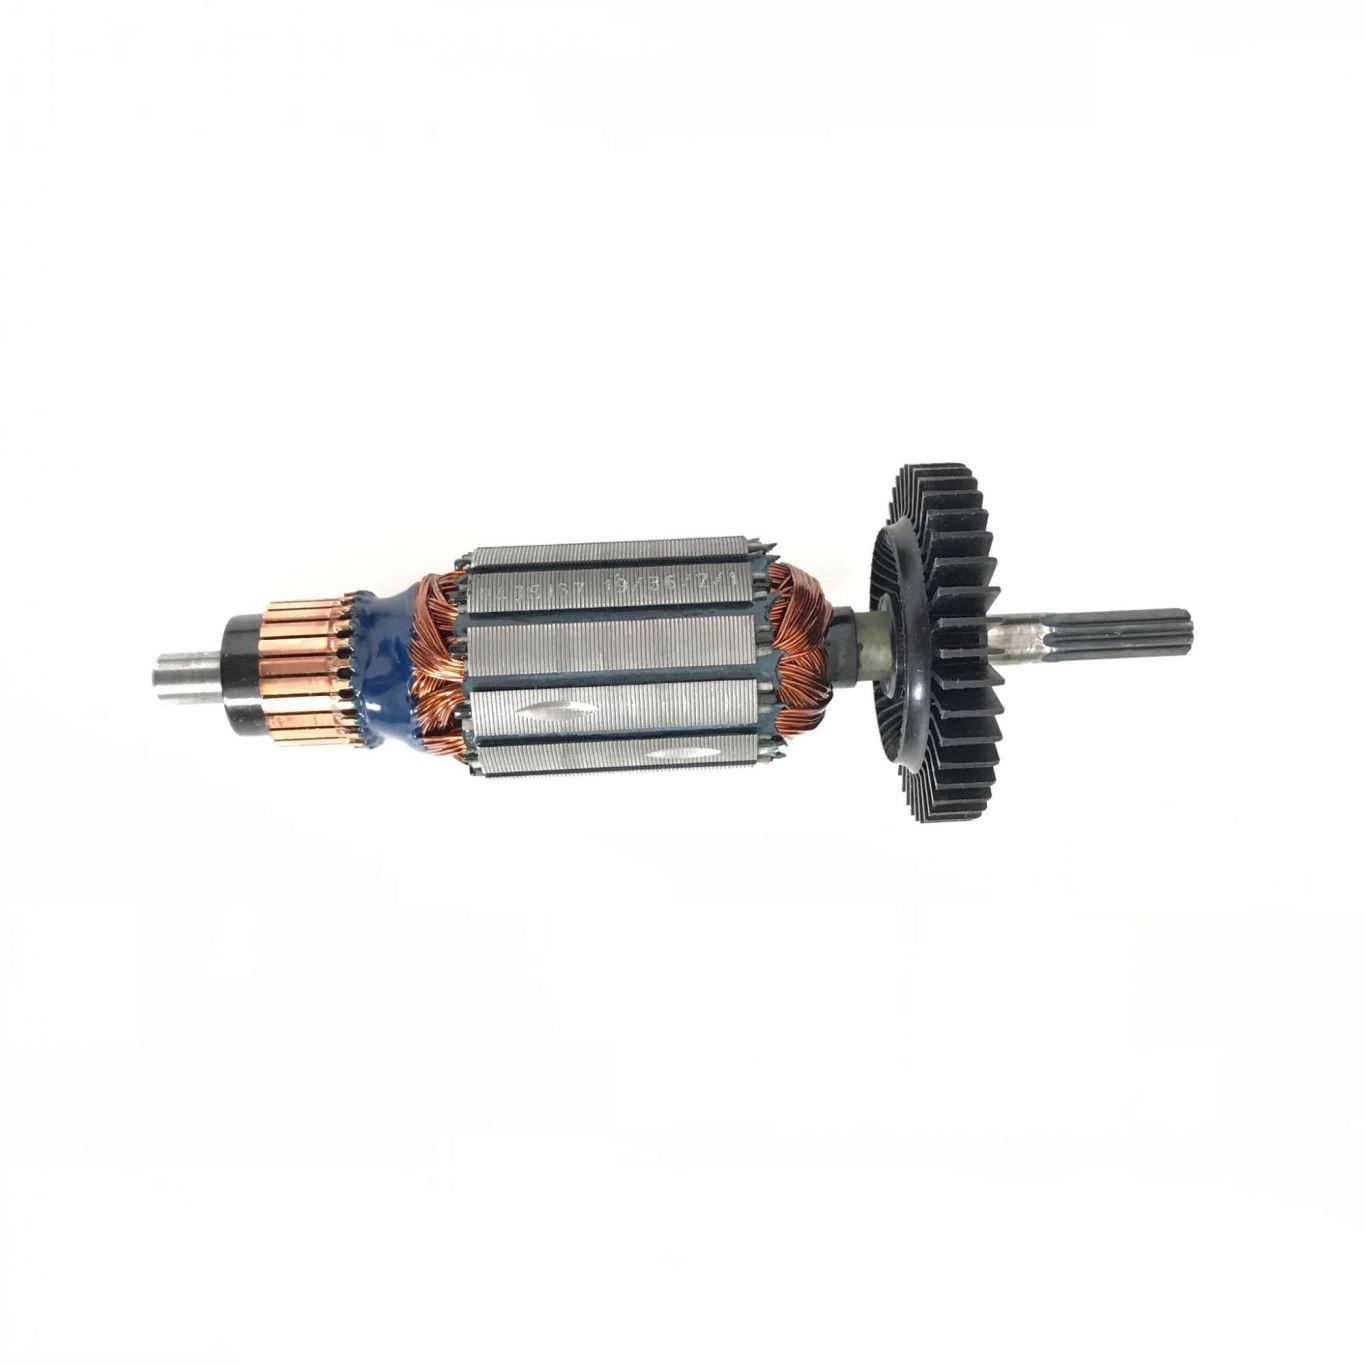 Conjunto Rotor 120v Dw300 Sc - Ref. N438167s - Dewalt - Produto Original